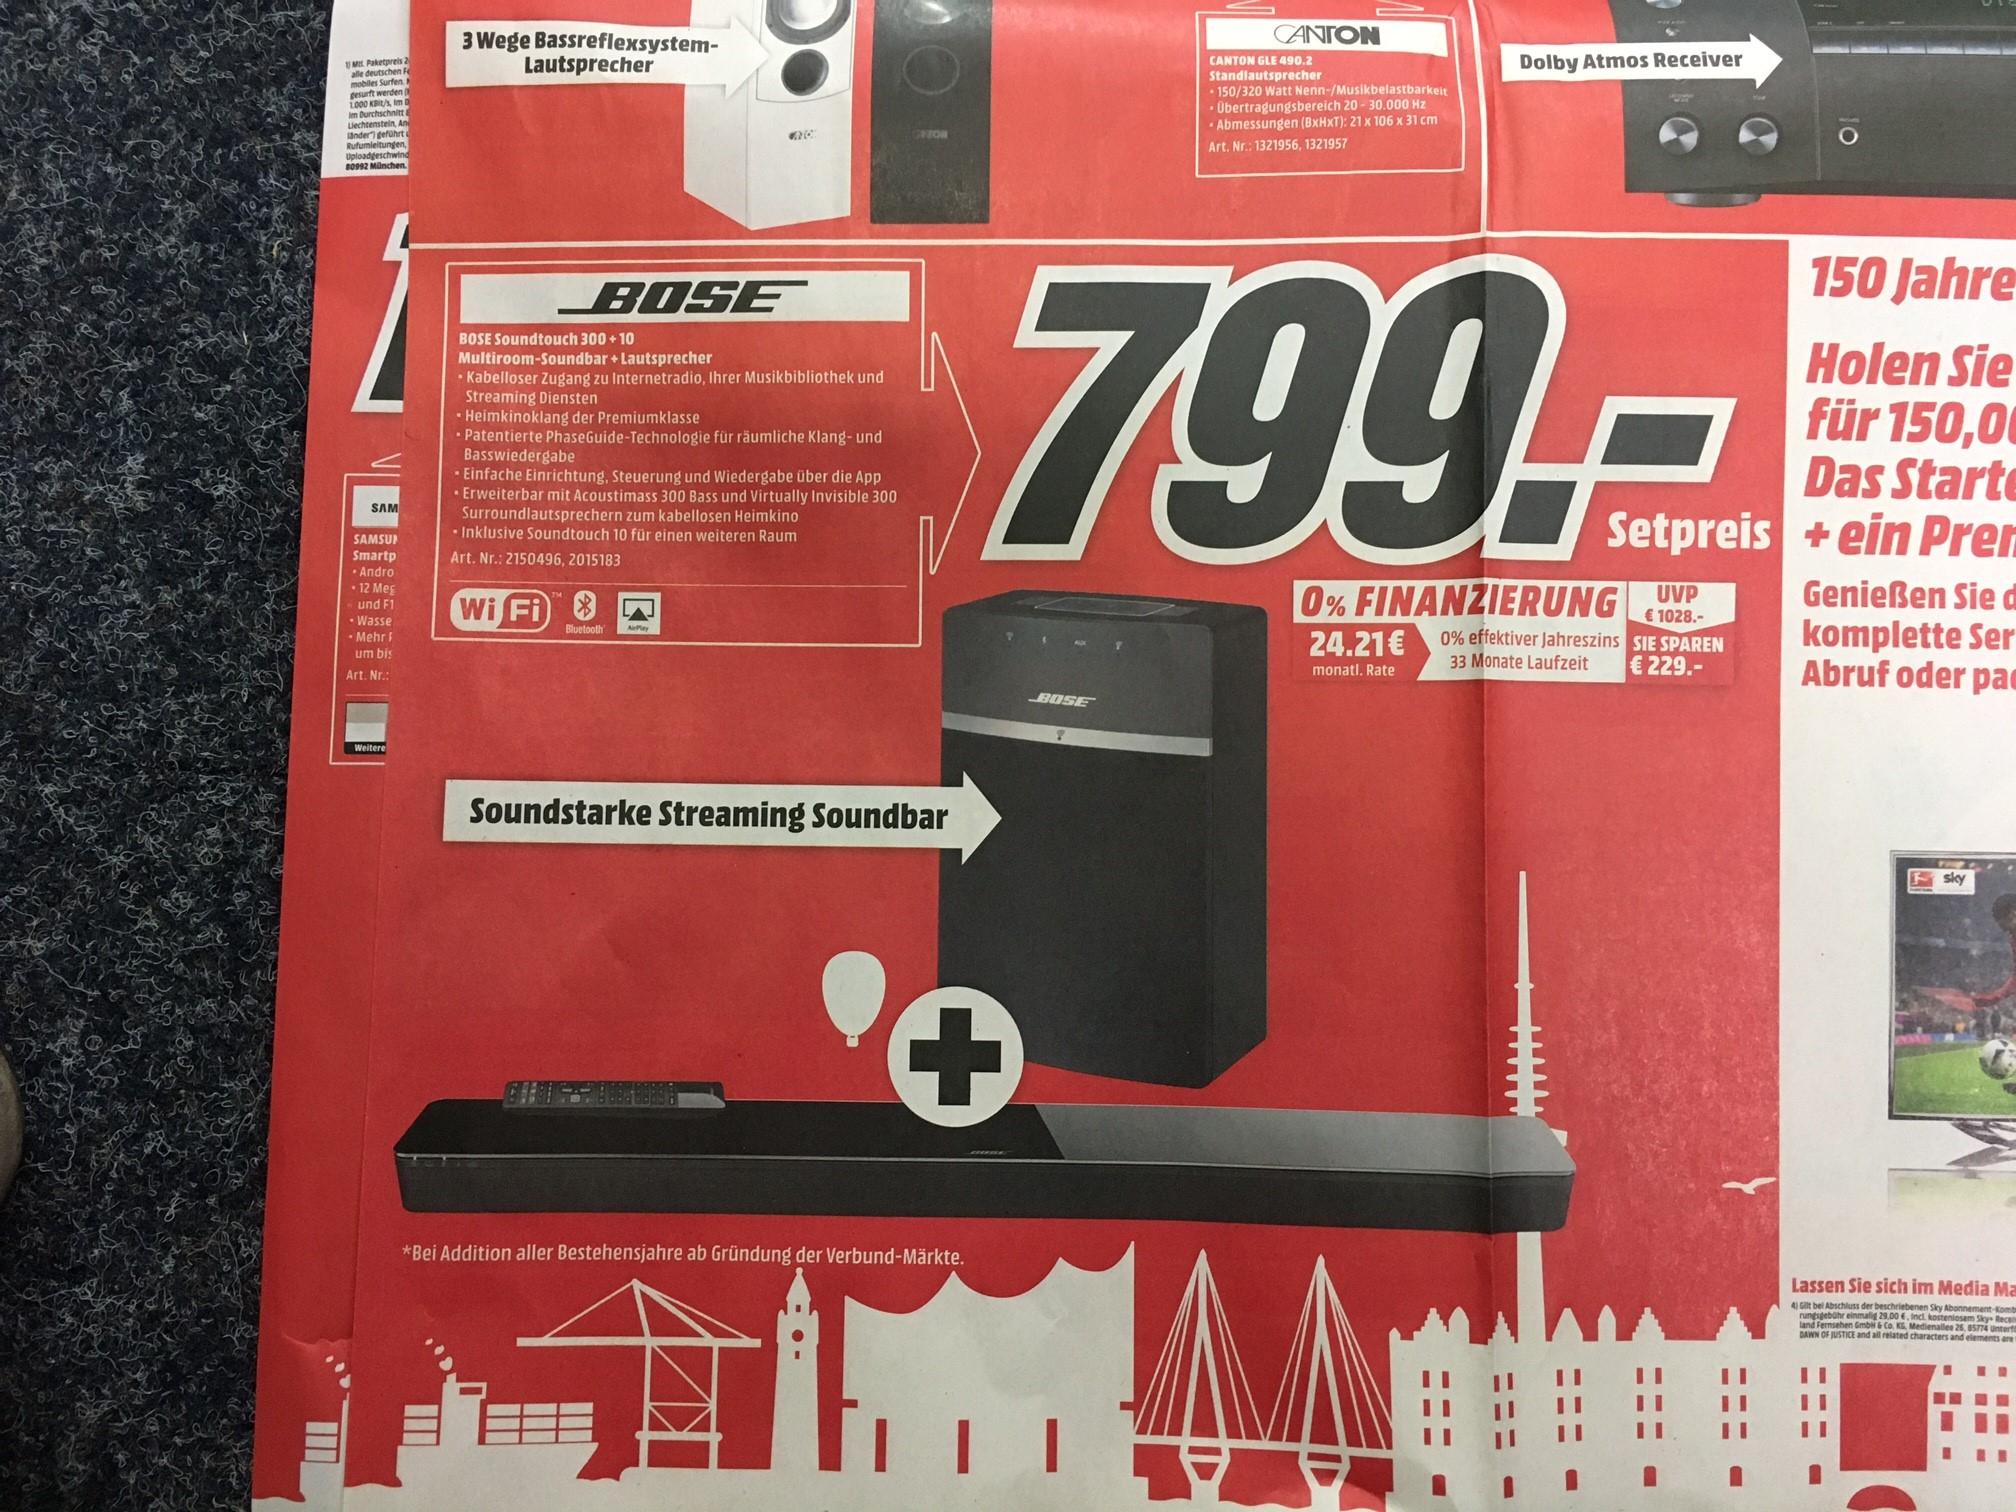 [Lokal MediaMarkt HH] Bose Soundtouch 300 + Bose Soundtouch 10 im Set 799€ (effektiv Soundtouch 10 gratis dazu)